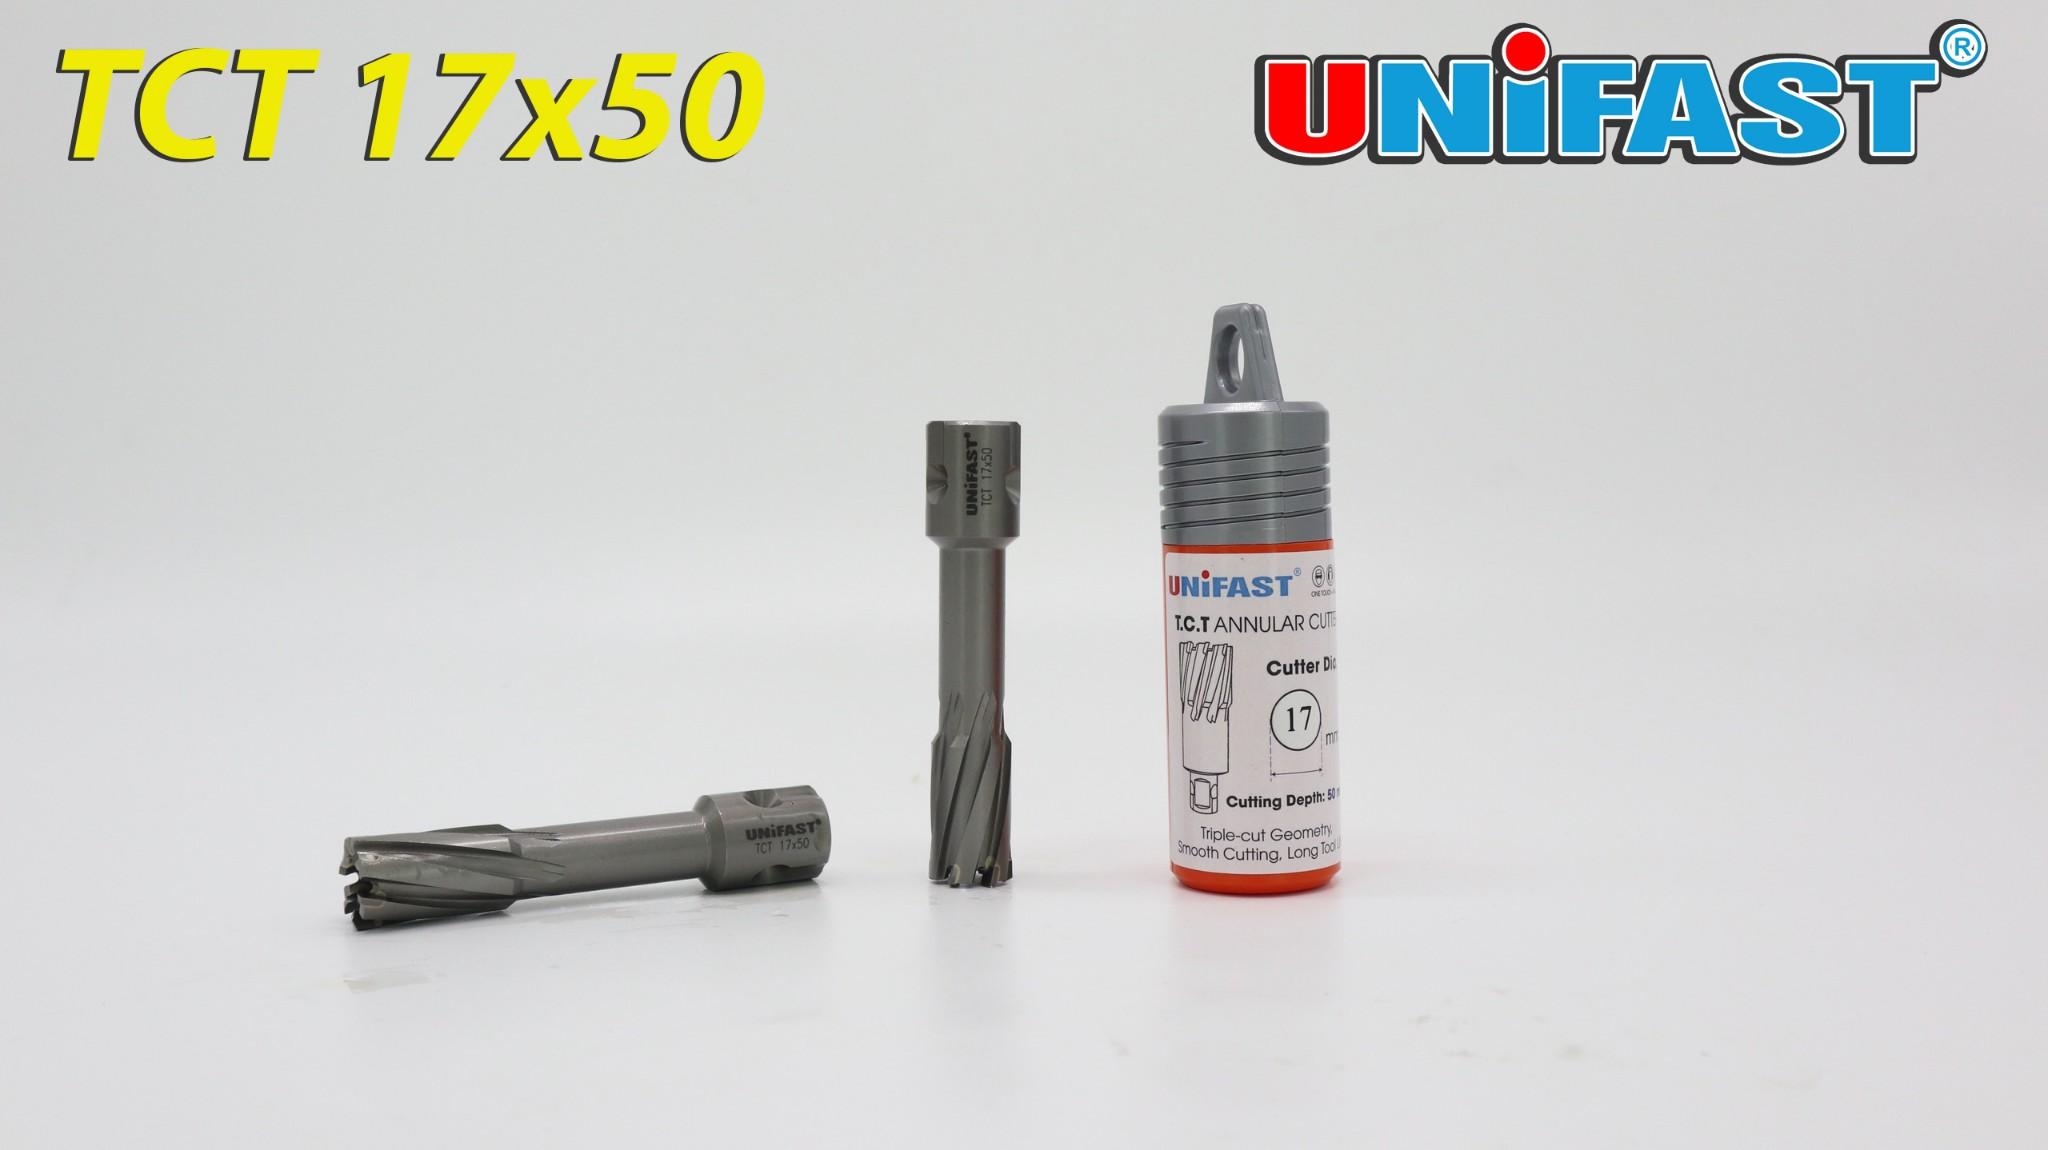 Mũi khoan hợp kim cứng hiệu Unifast Model TCT 17x50